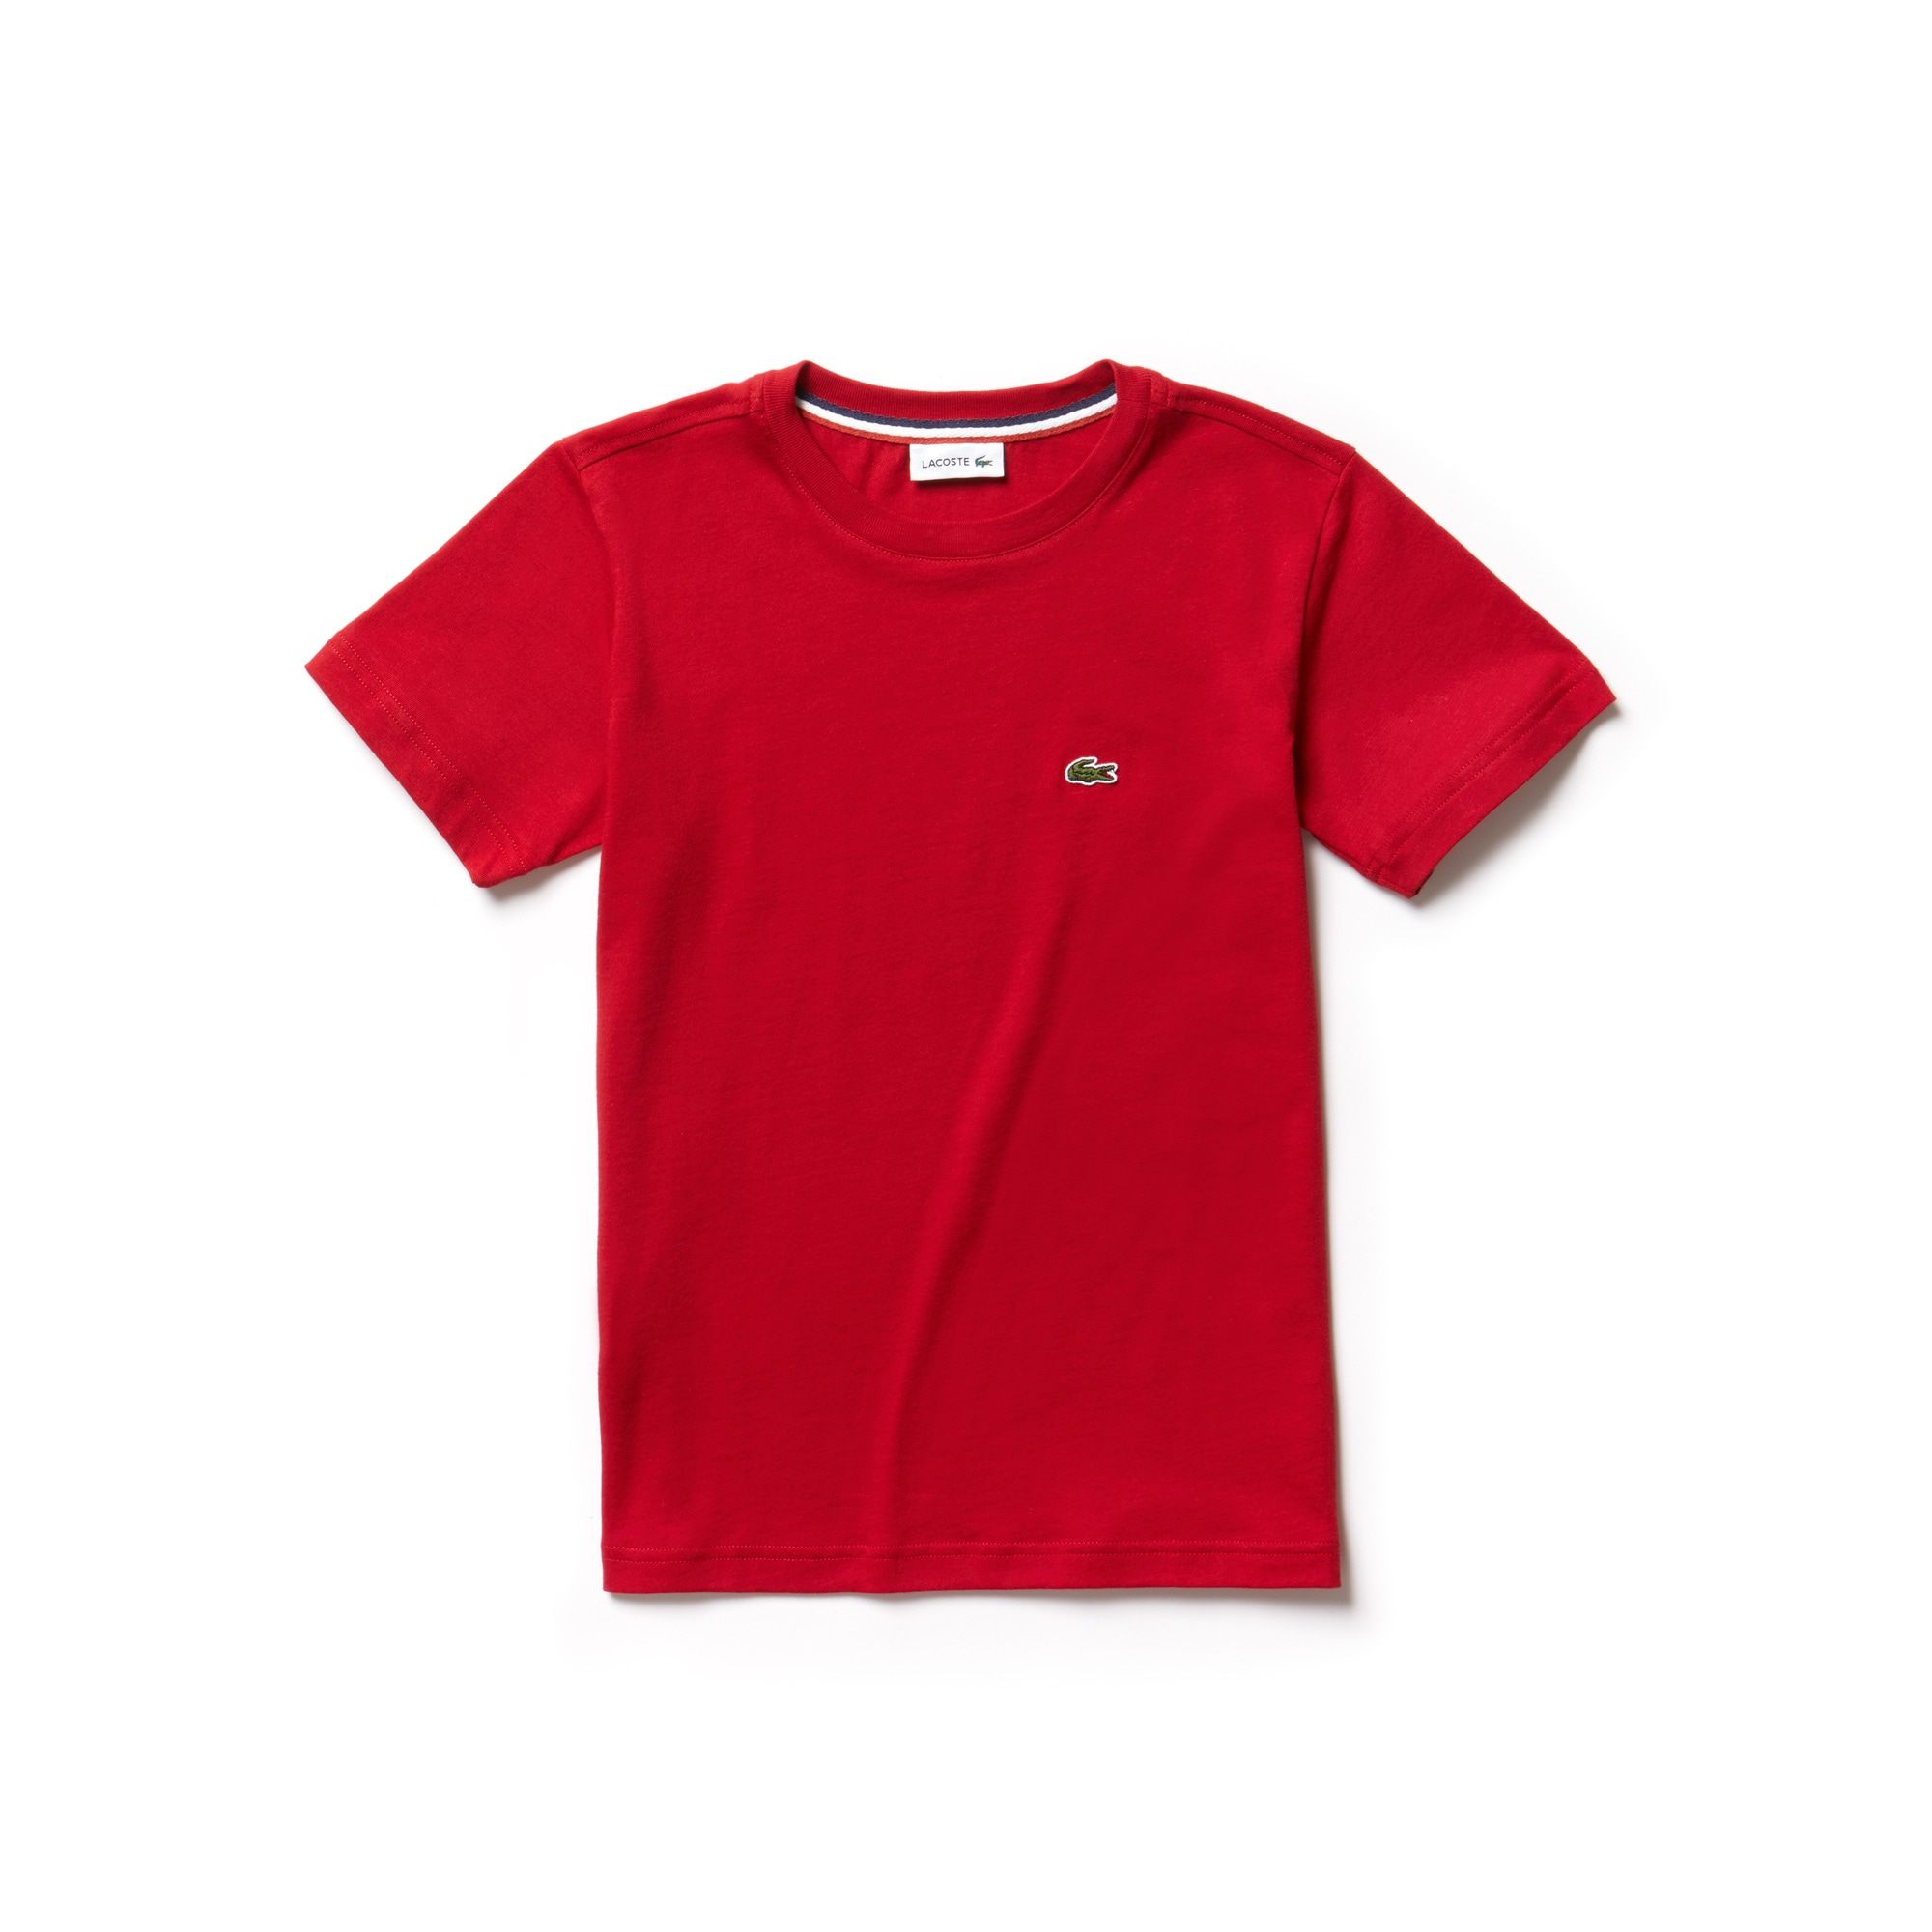 a440dc5dd3963 Camisetas